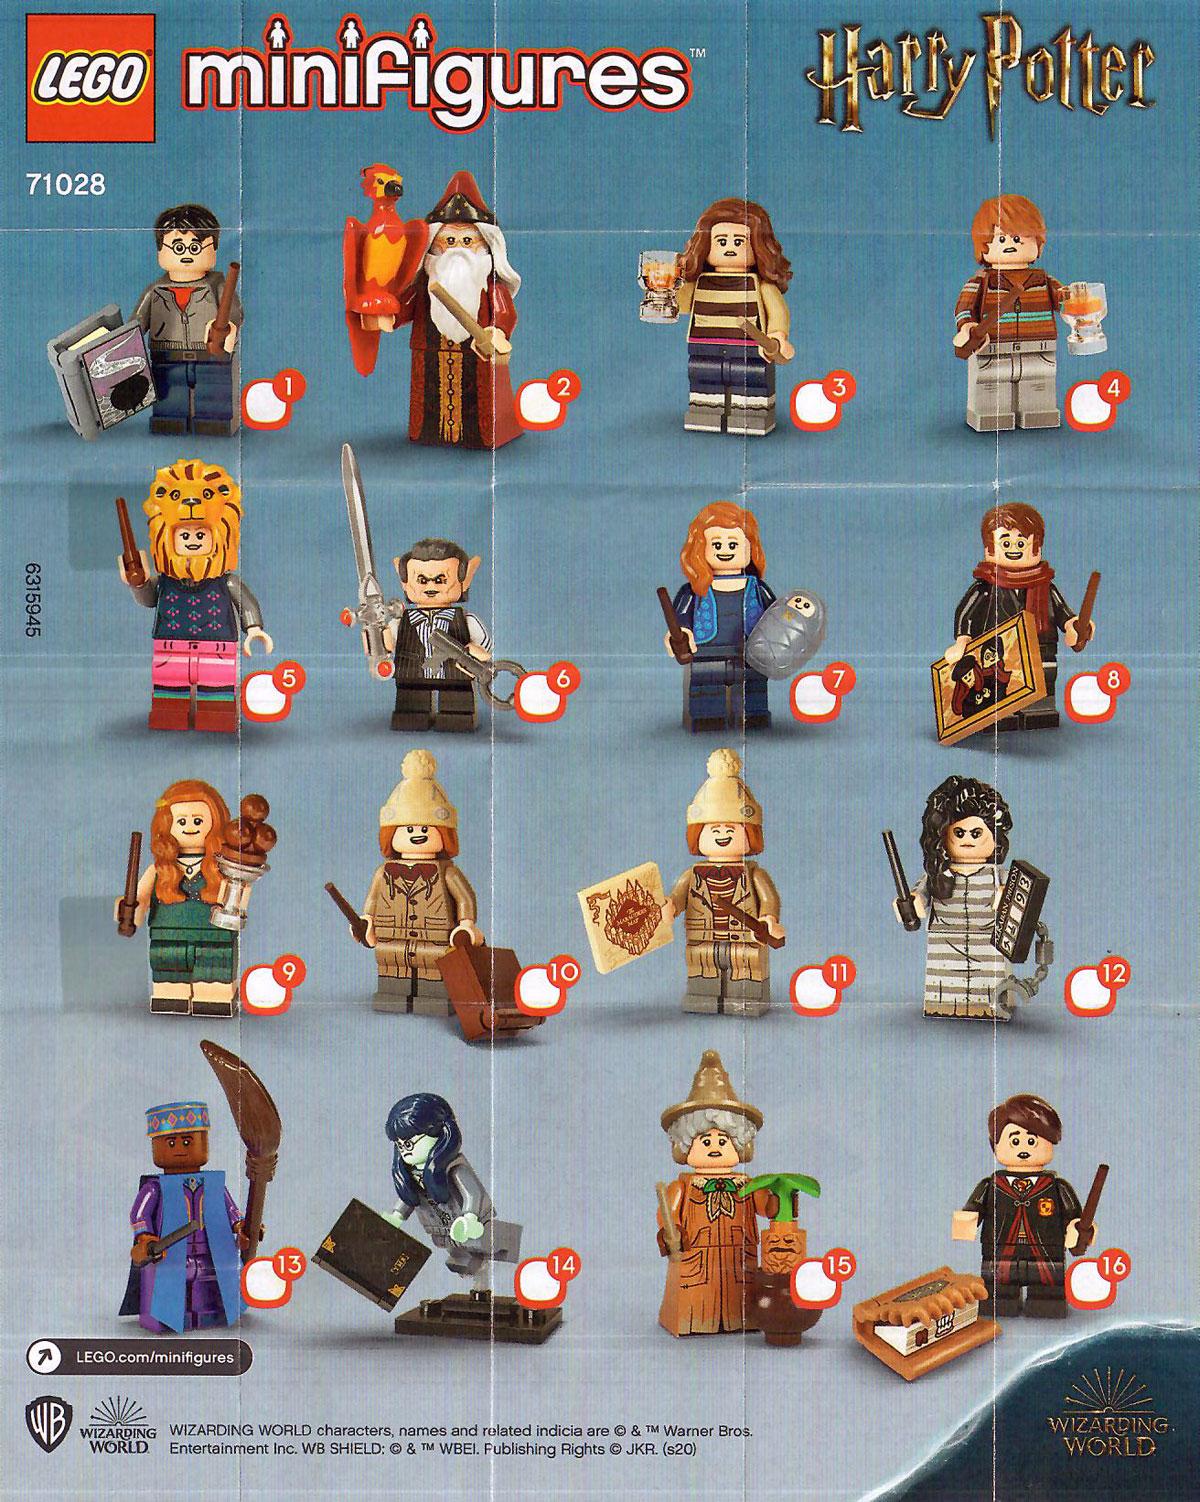 brickfinder - lego harry potter cmf series 2 (71028) full